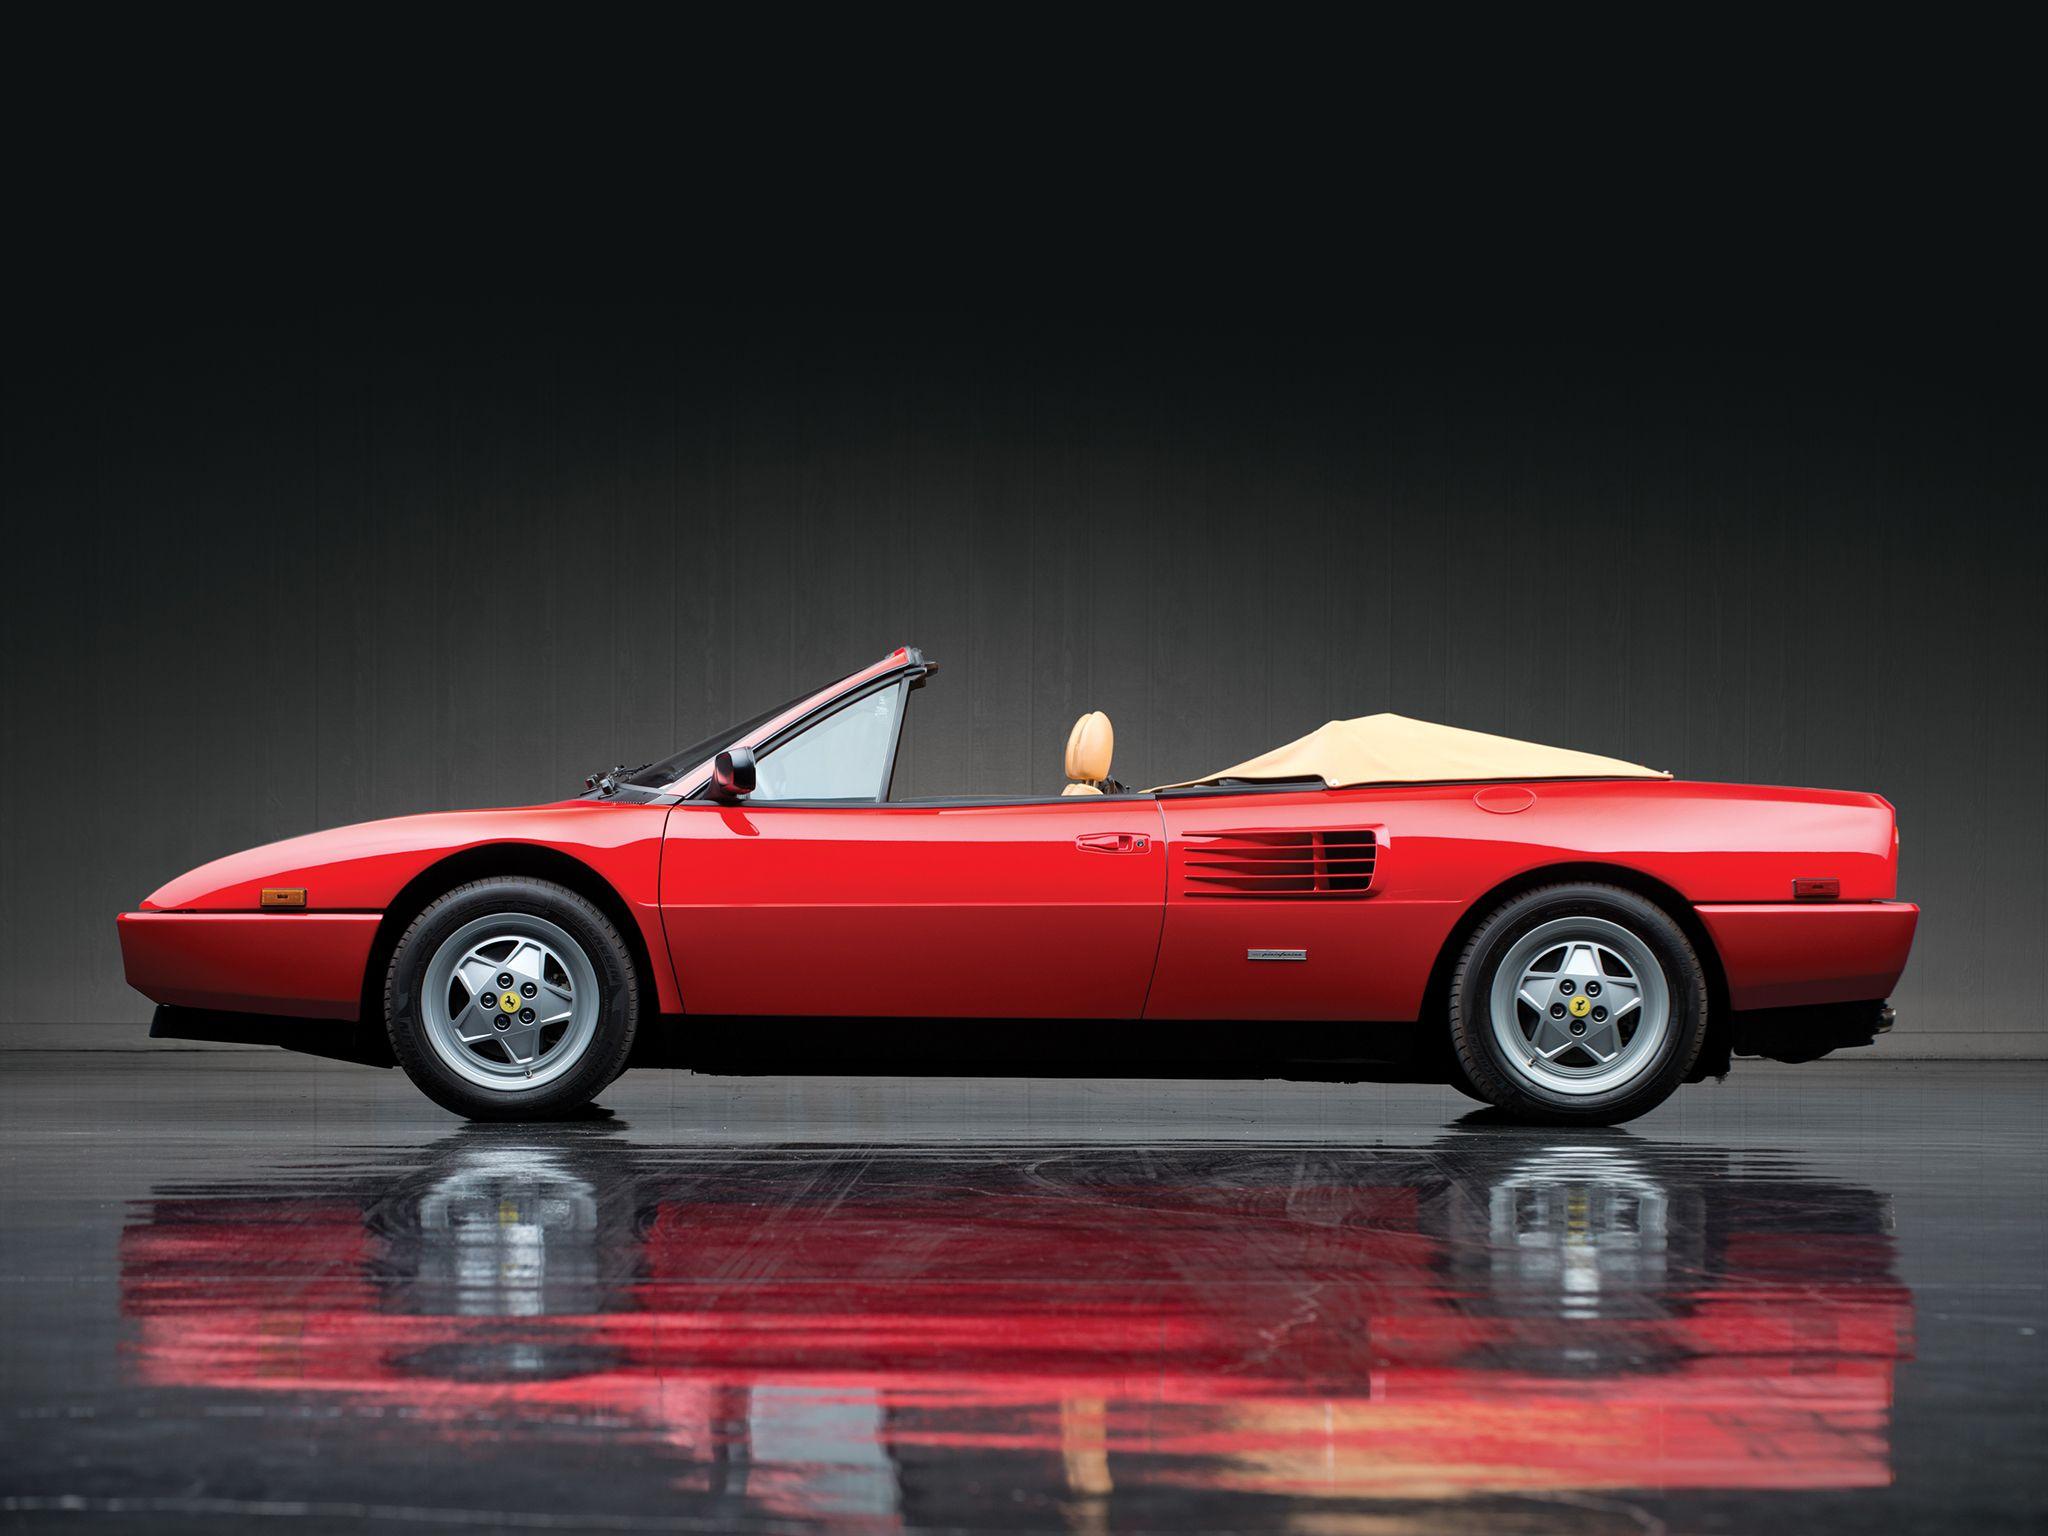 fd7dd1fae3982bb6182fcb450198a573 Remarkable Ferrari Mondial Rear Window Motor Cars Trend